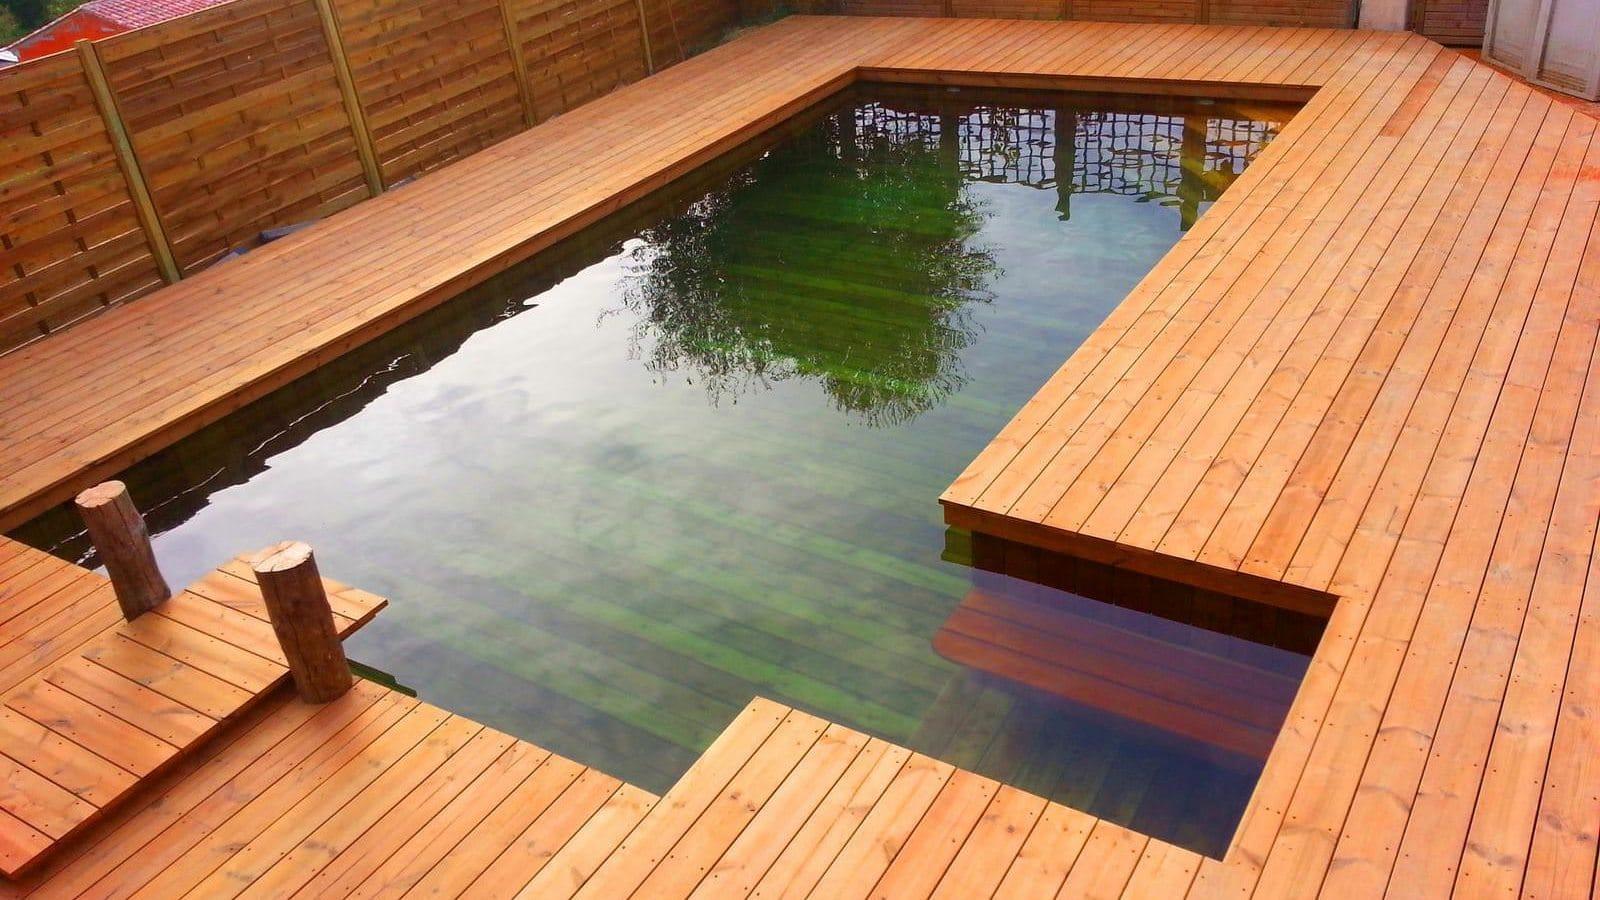 Odyssea la piscine tout bois qui monte id es piscine for Odyssea piscine